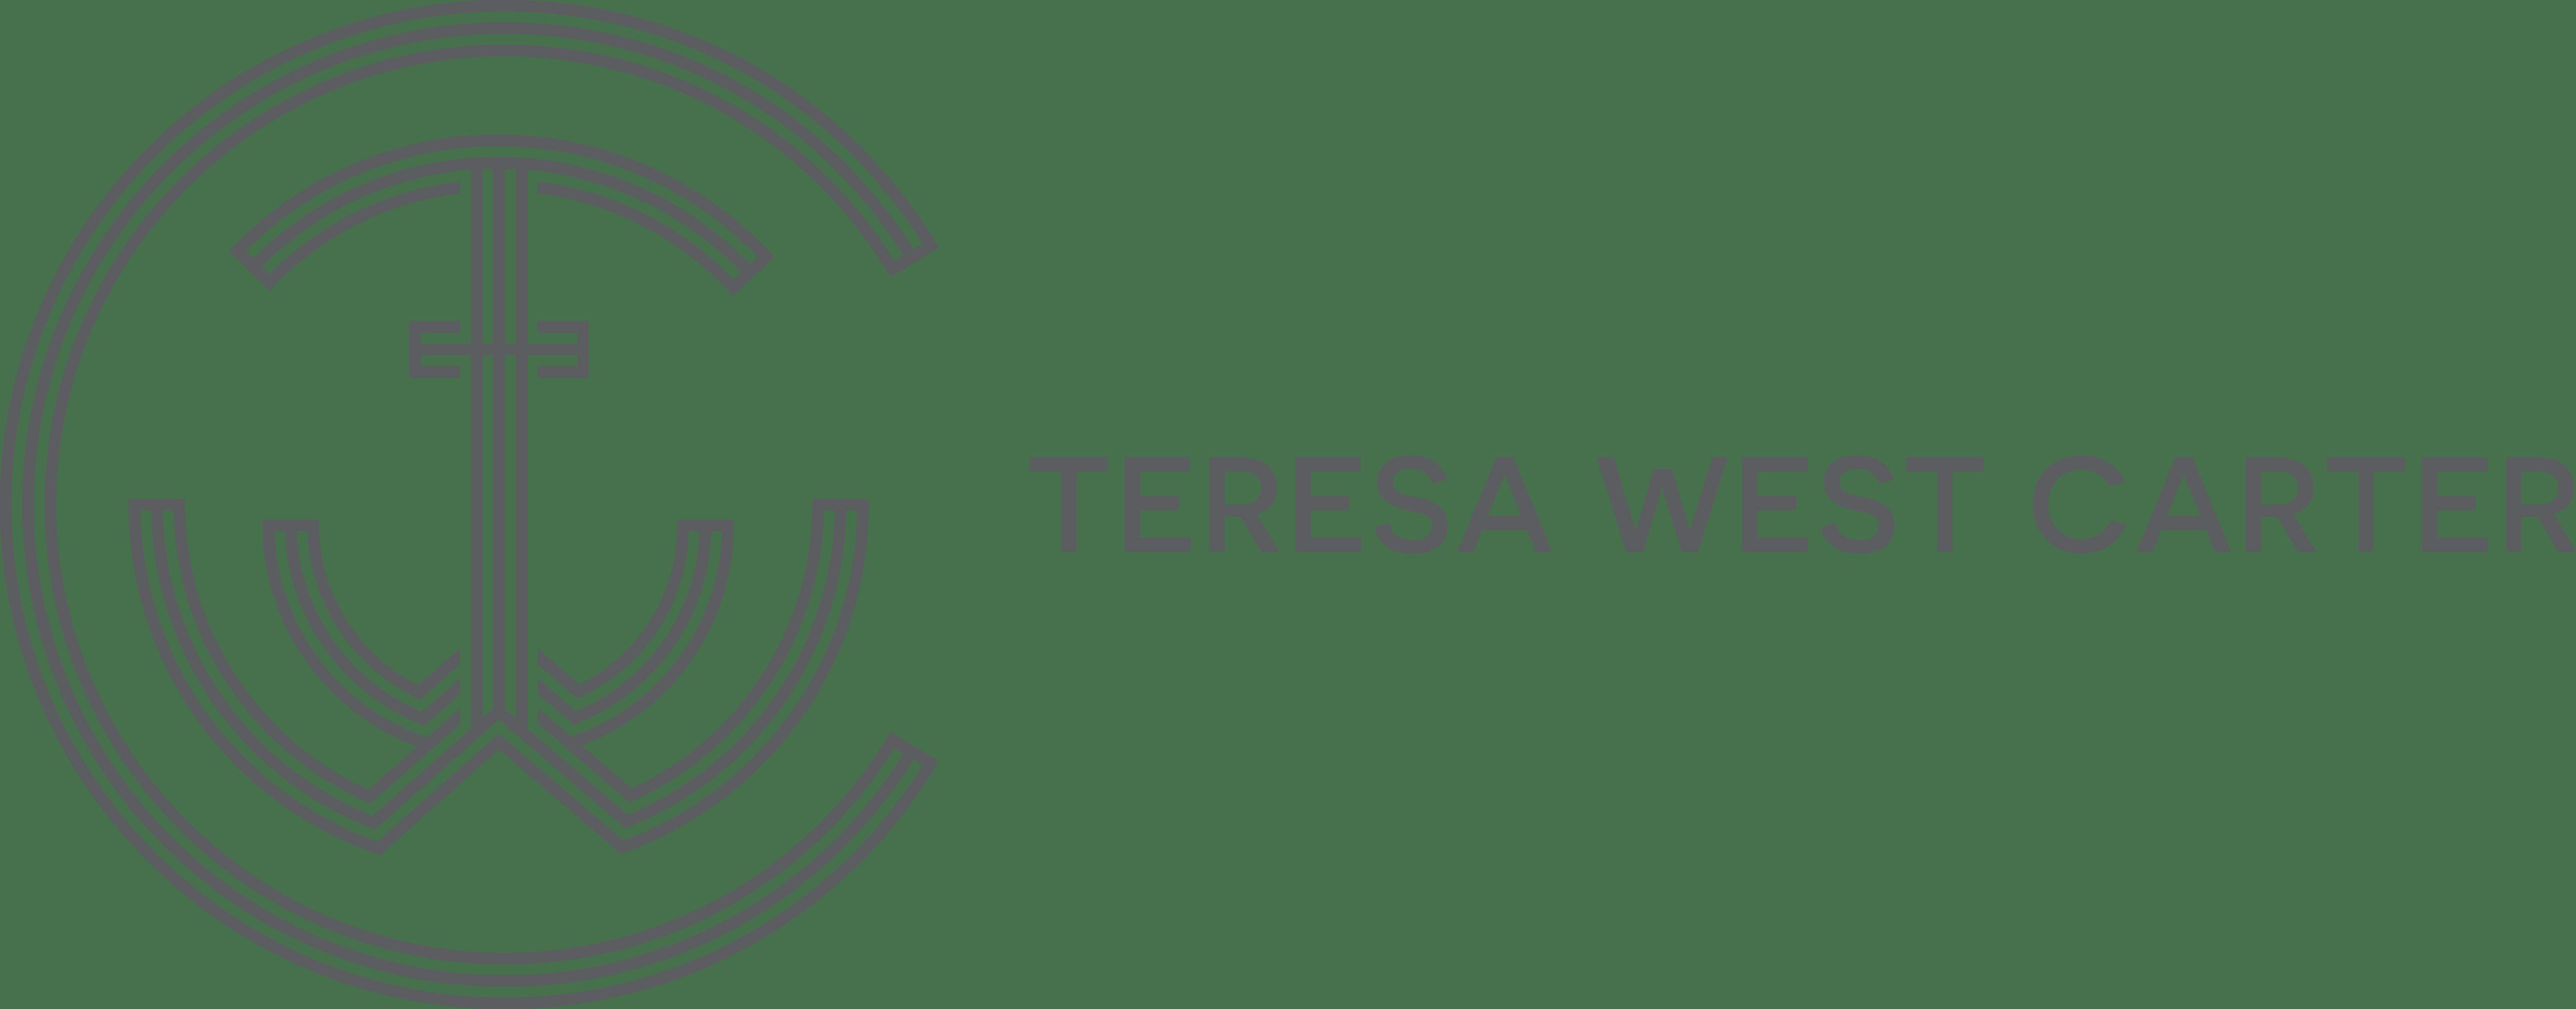 Teresa West Carter